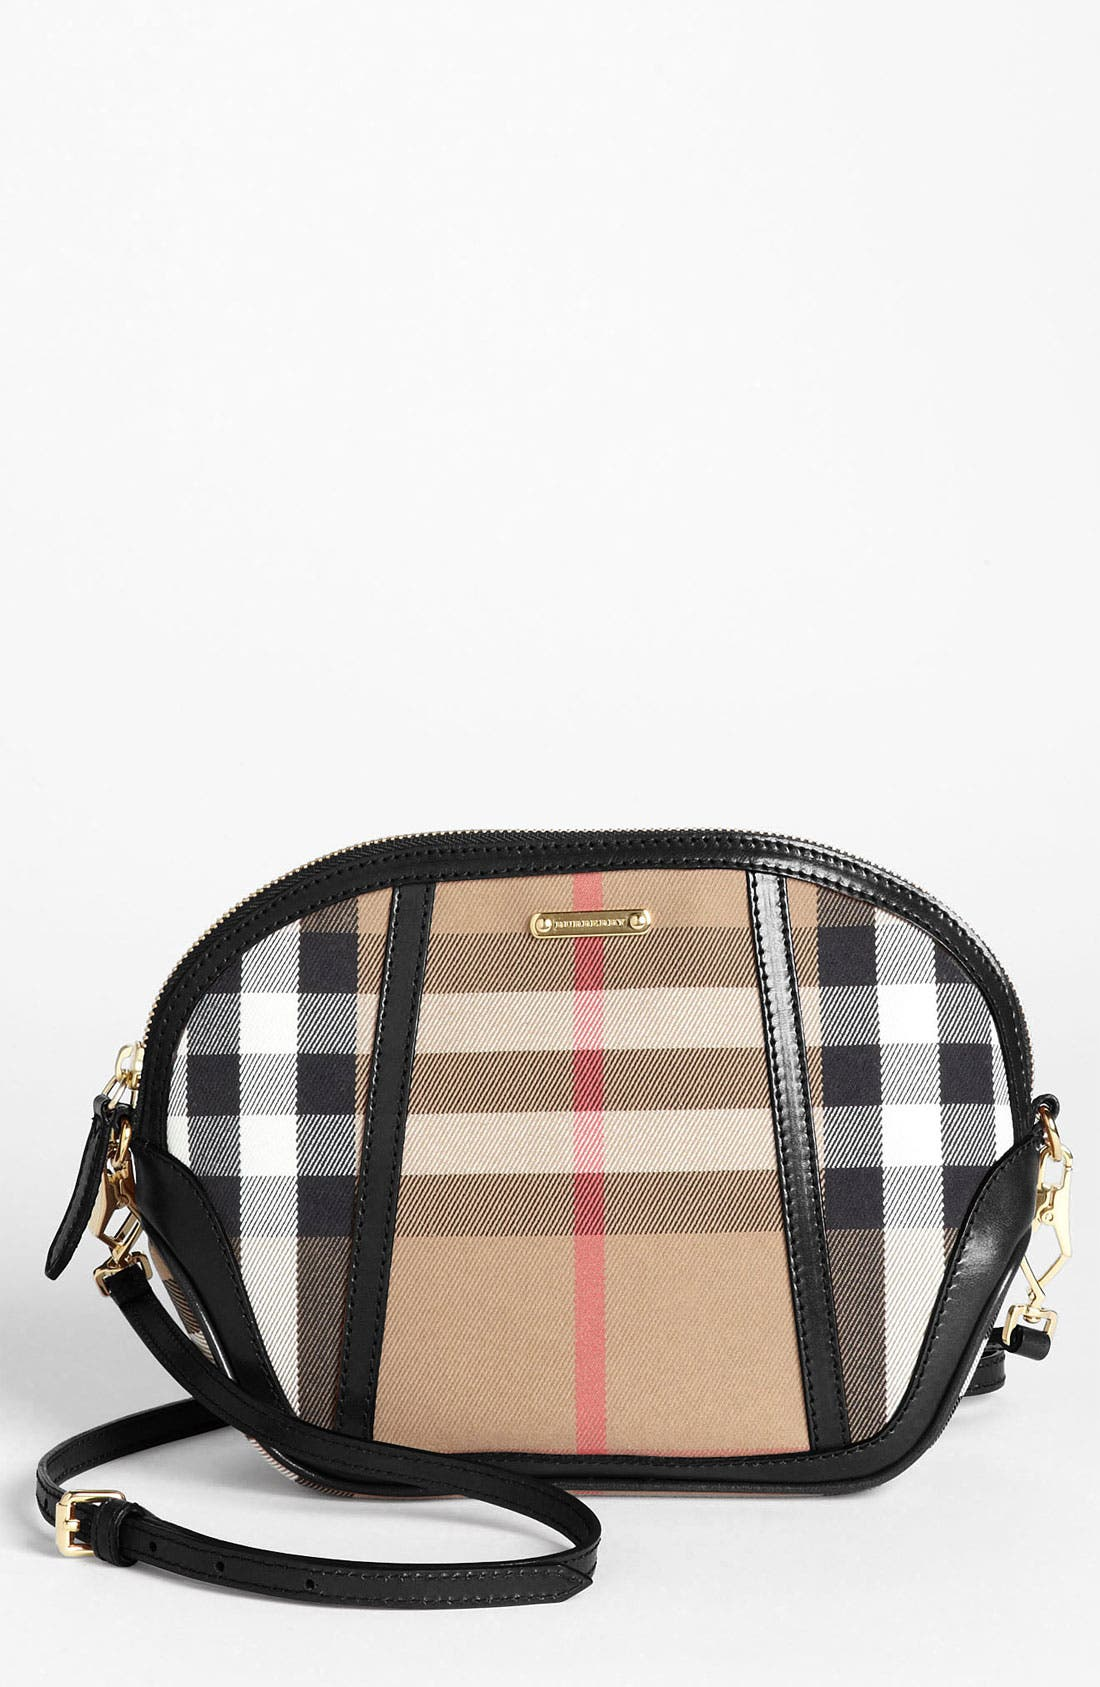 Main Image - Burberry 'House Check' Crossbody Bag, Small